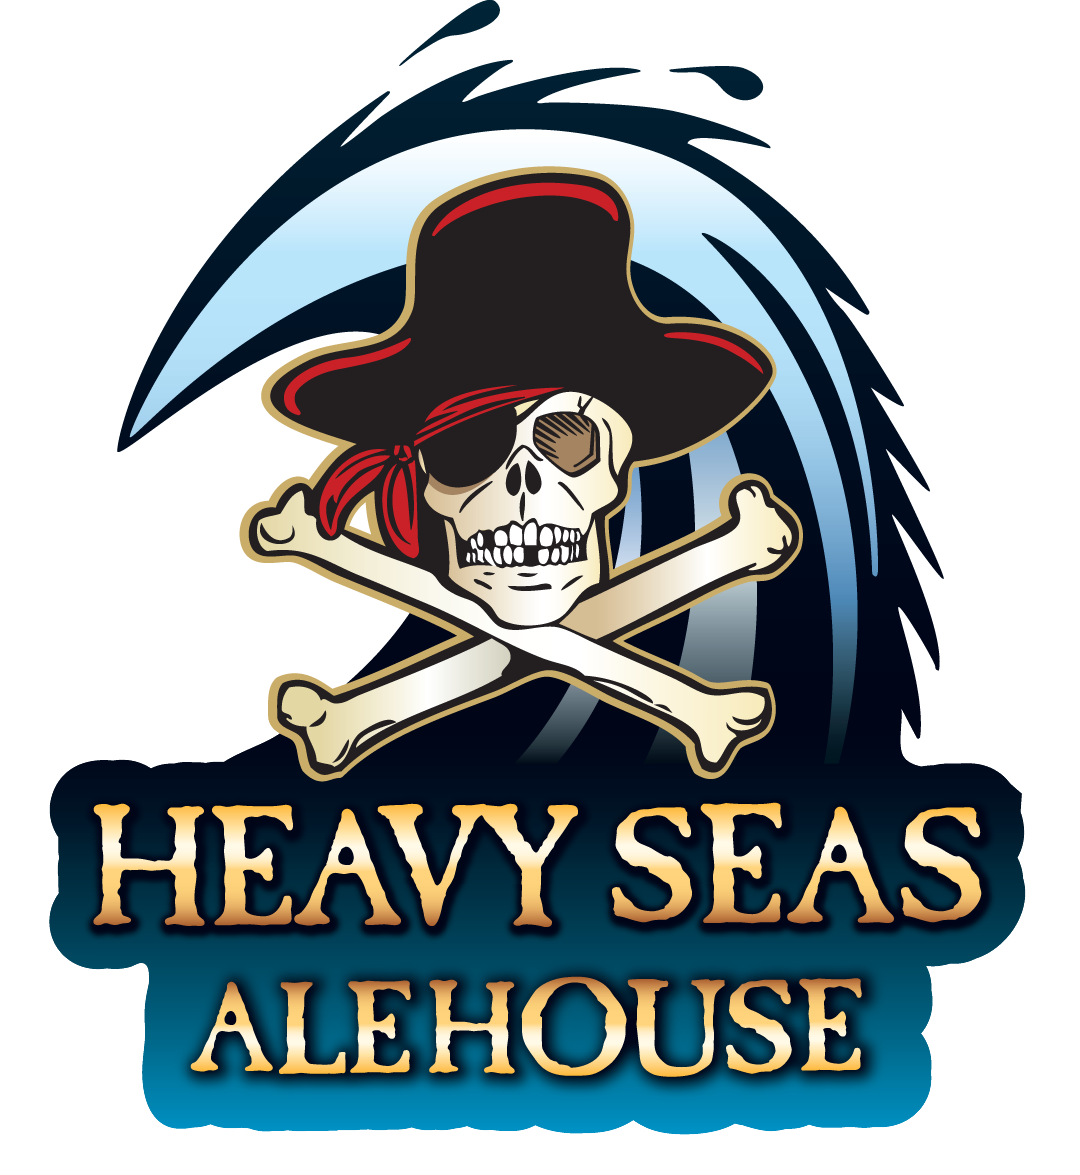 HeavySeasAlehouse-web.png